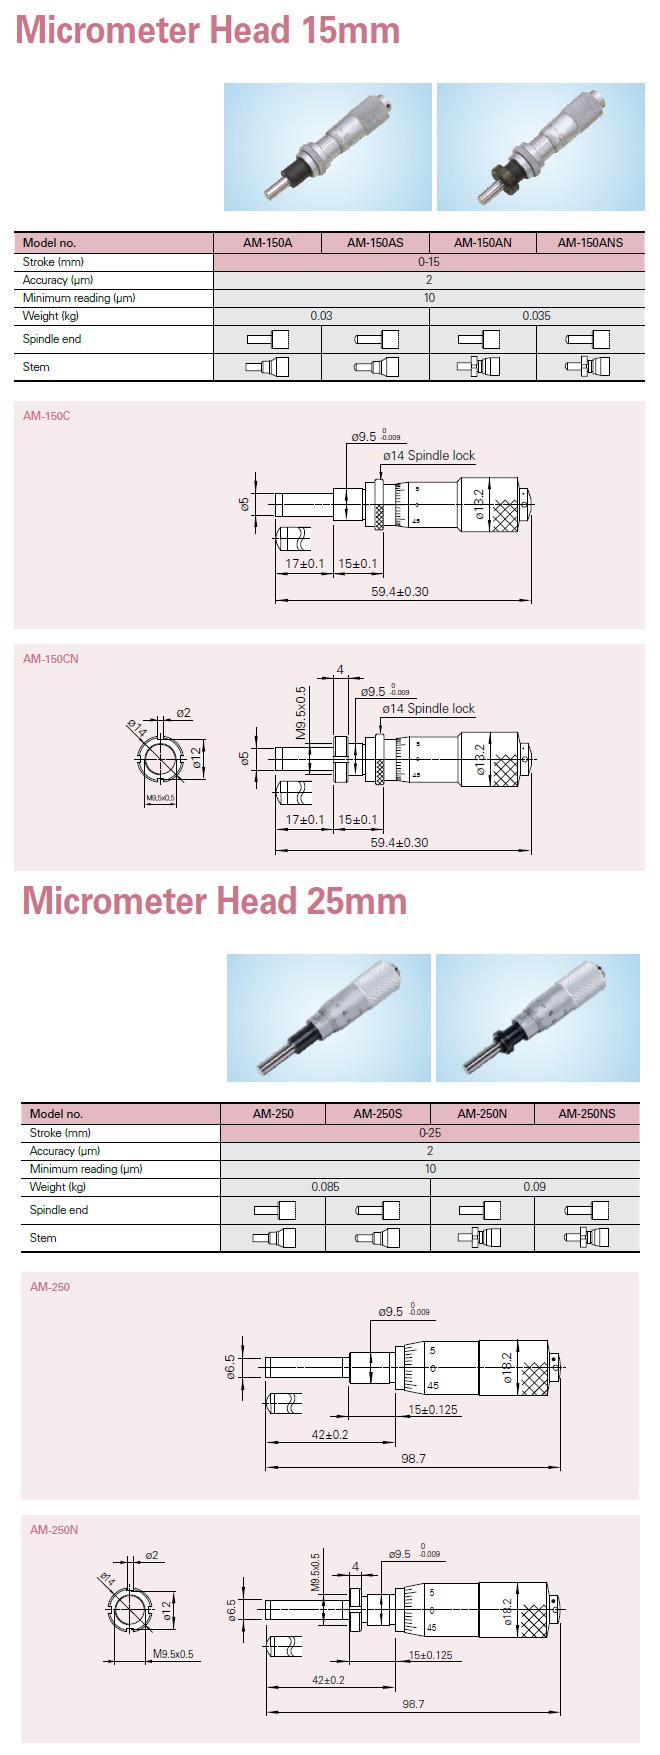 AIN Micrometer Head 15mm, 25mm